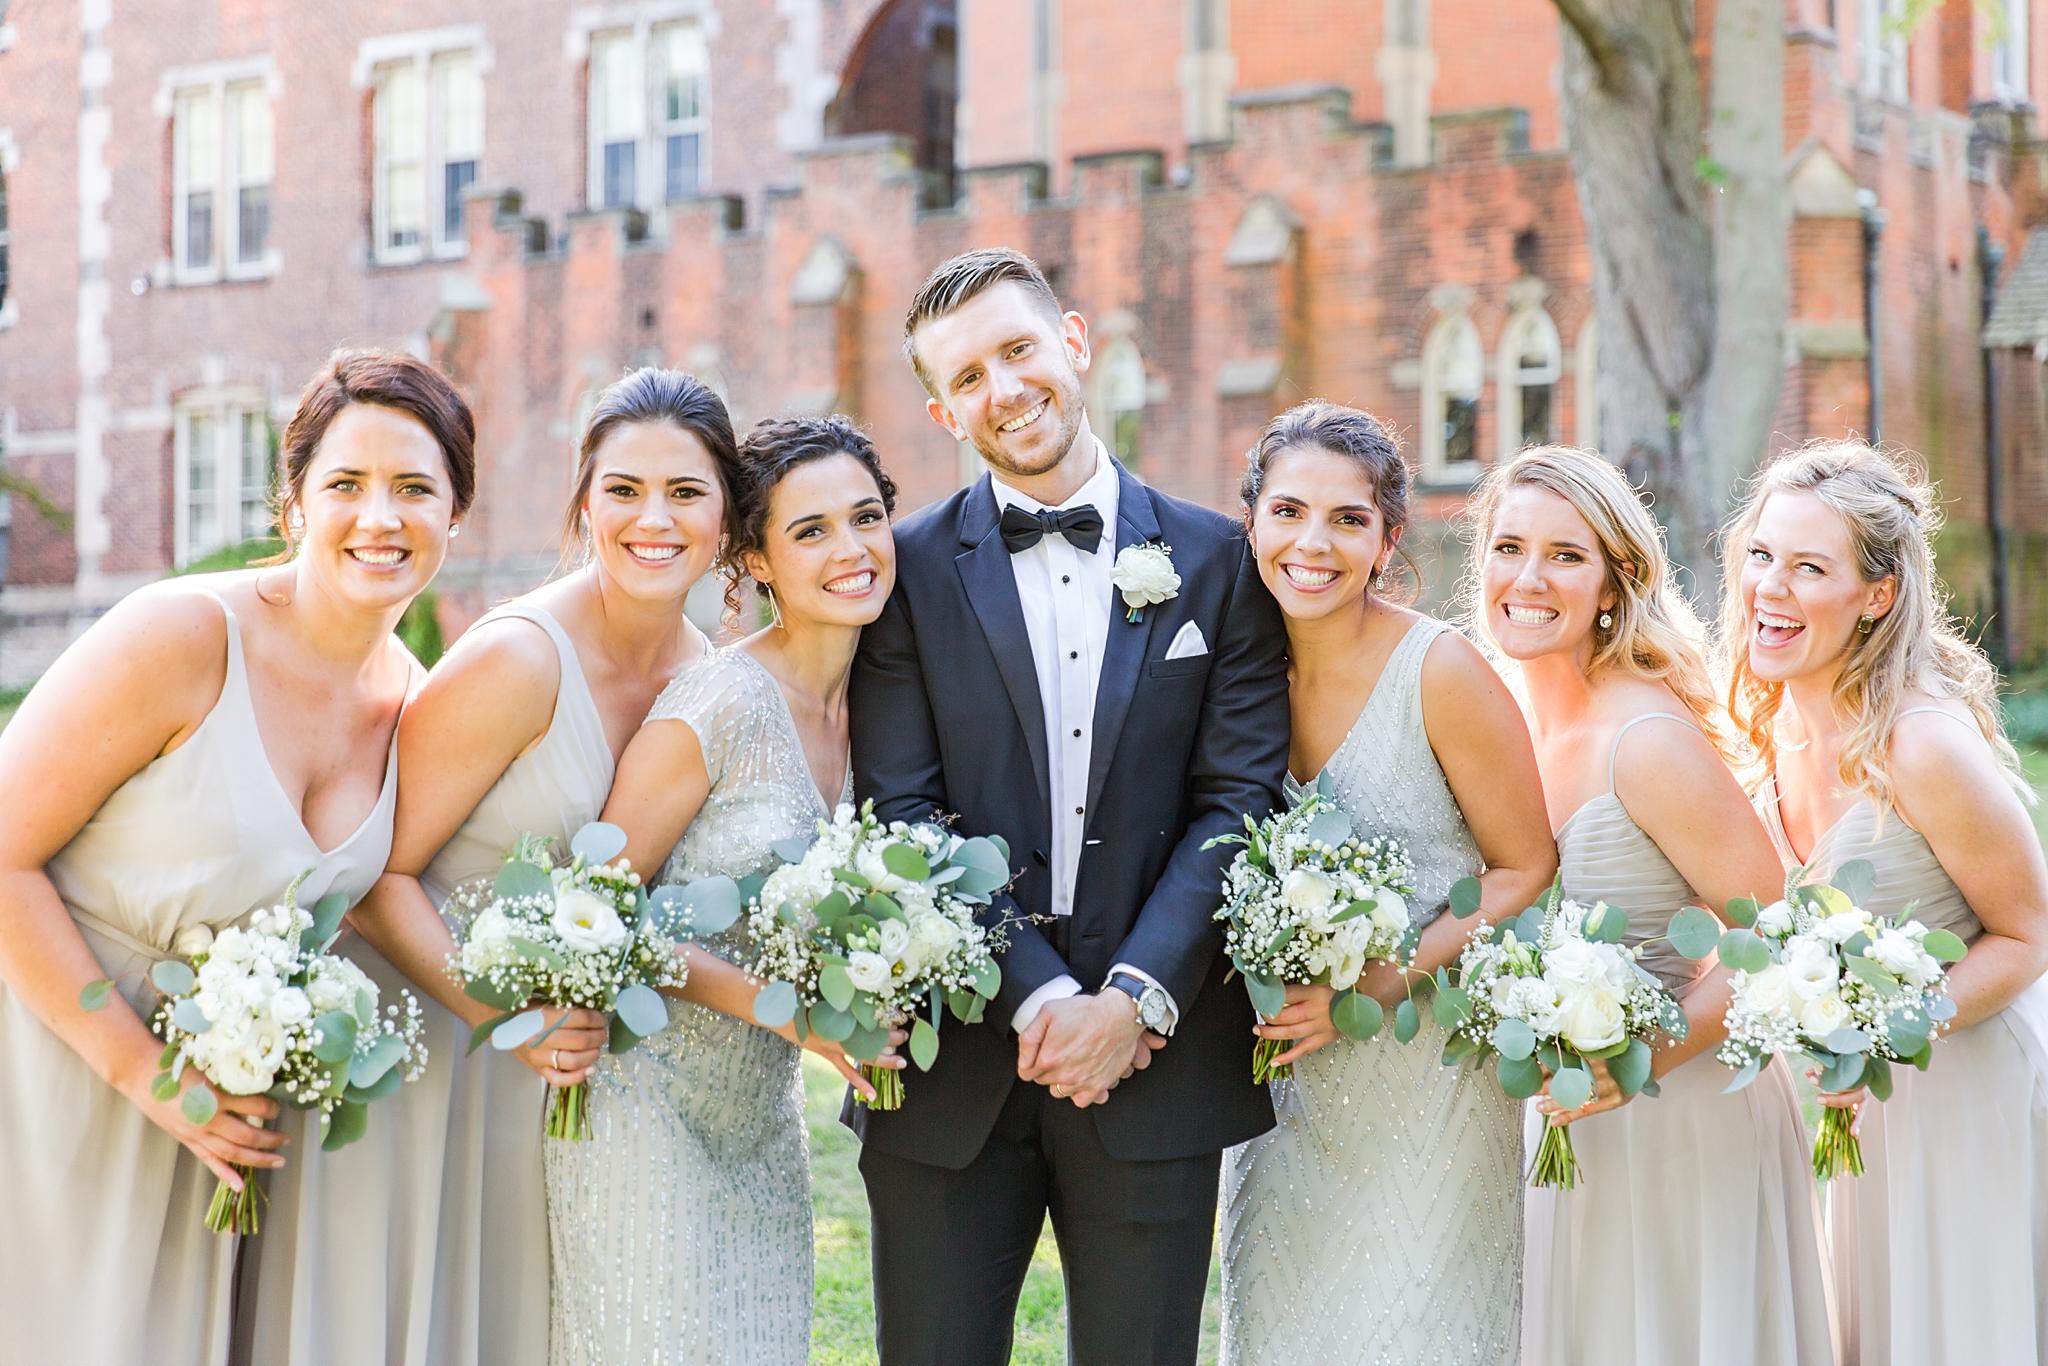 detroit-wedding-photographer-grosse-pointe-academy-chapel-detroit-golf-club-wedding-carly-matt-by-courtney-carolyn-photography_0080.jpg